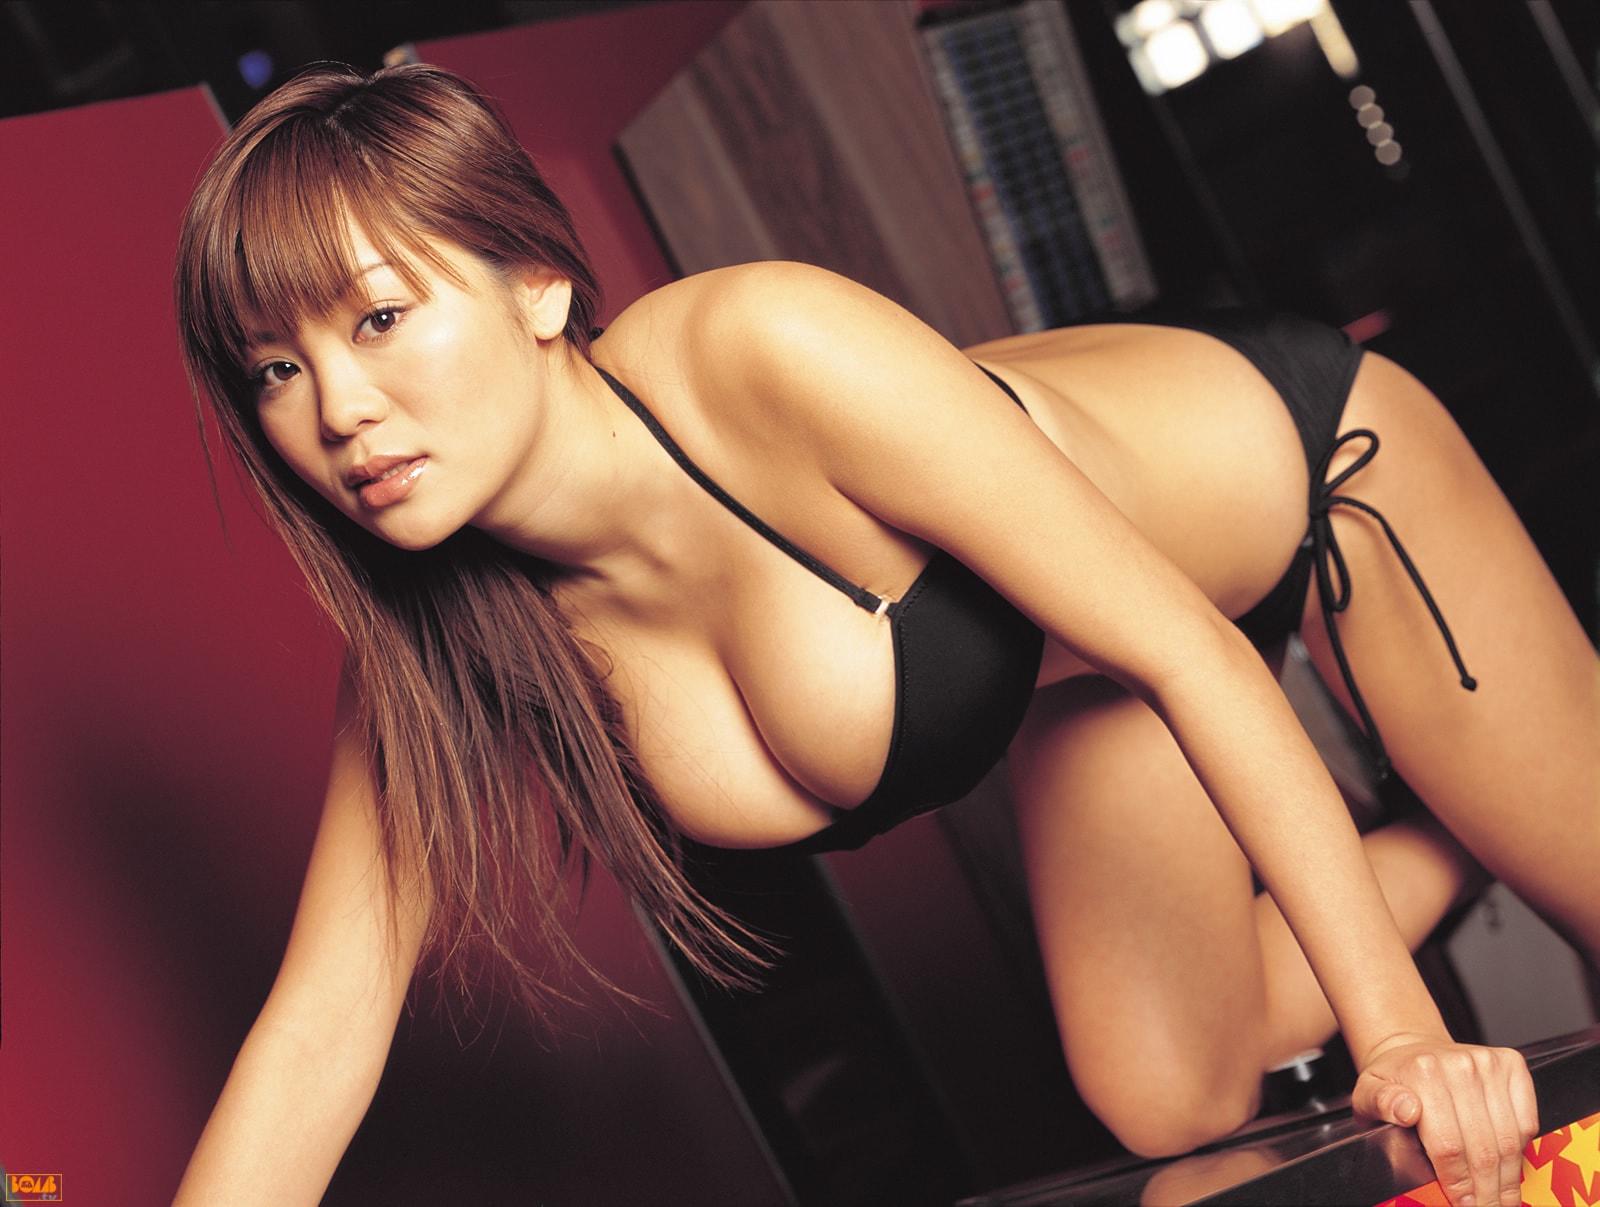 松金洋子 Bomb.TV 2004 Yoko Matsugane 77photos